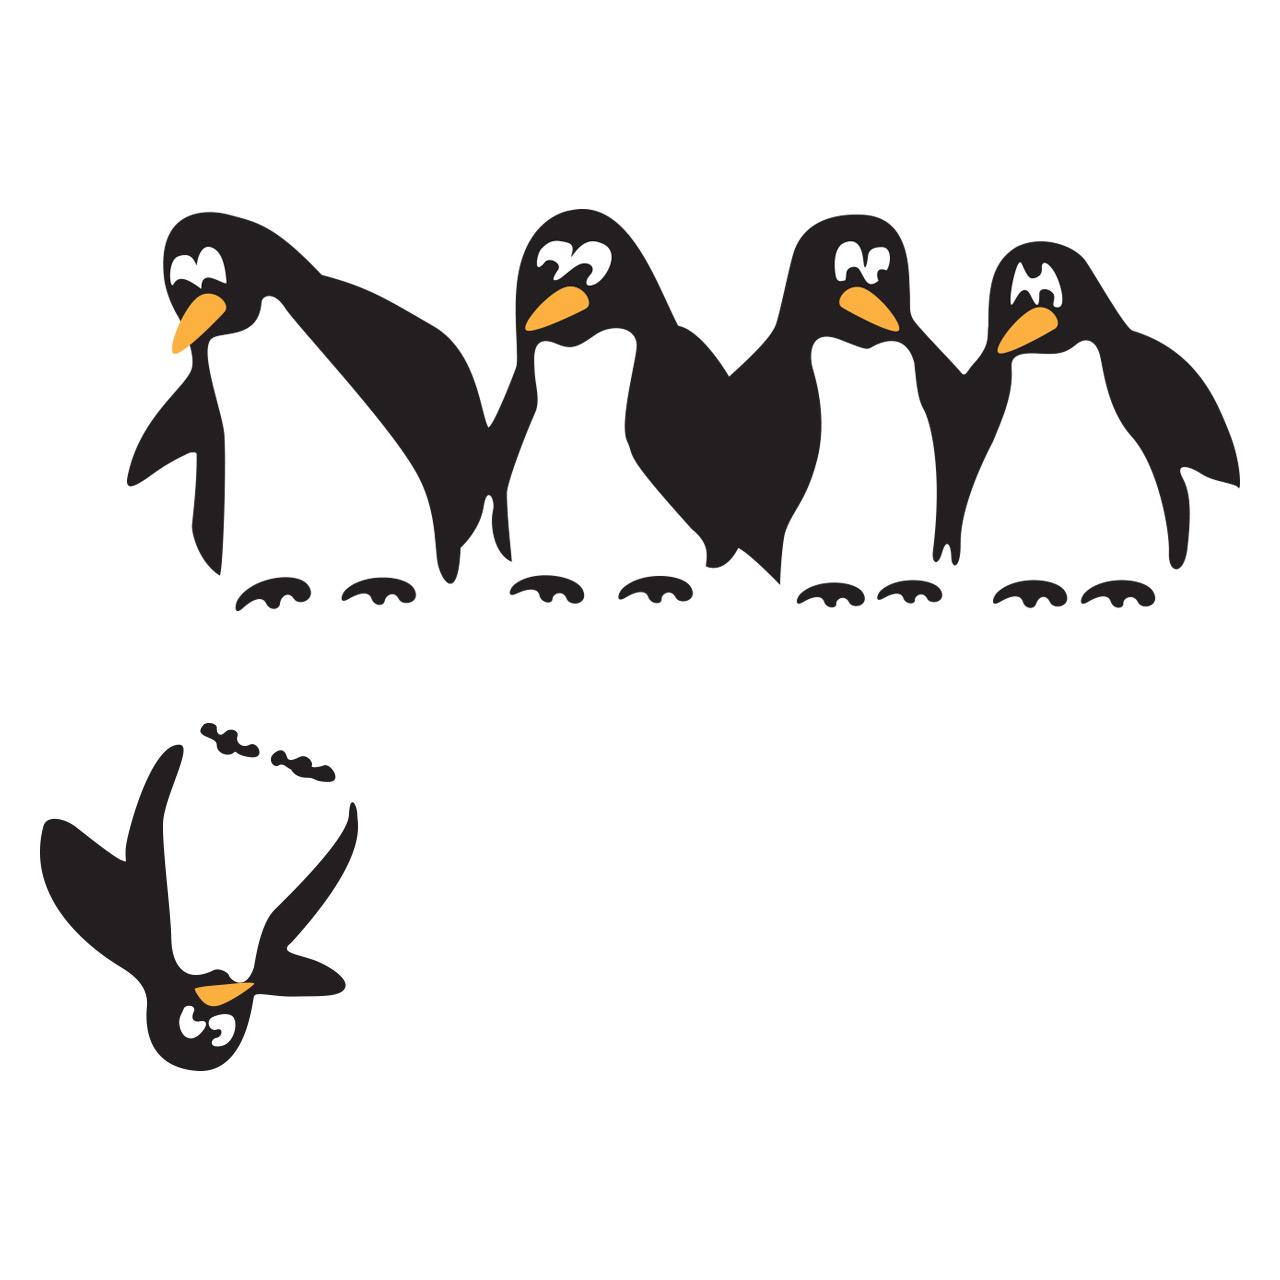 استیکر یخچال گراسیپا مدل پنگوئن ها